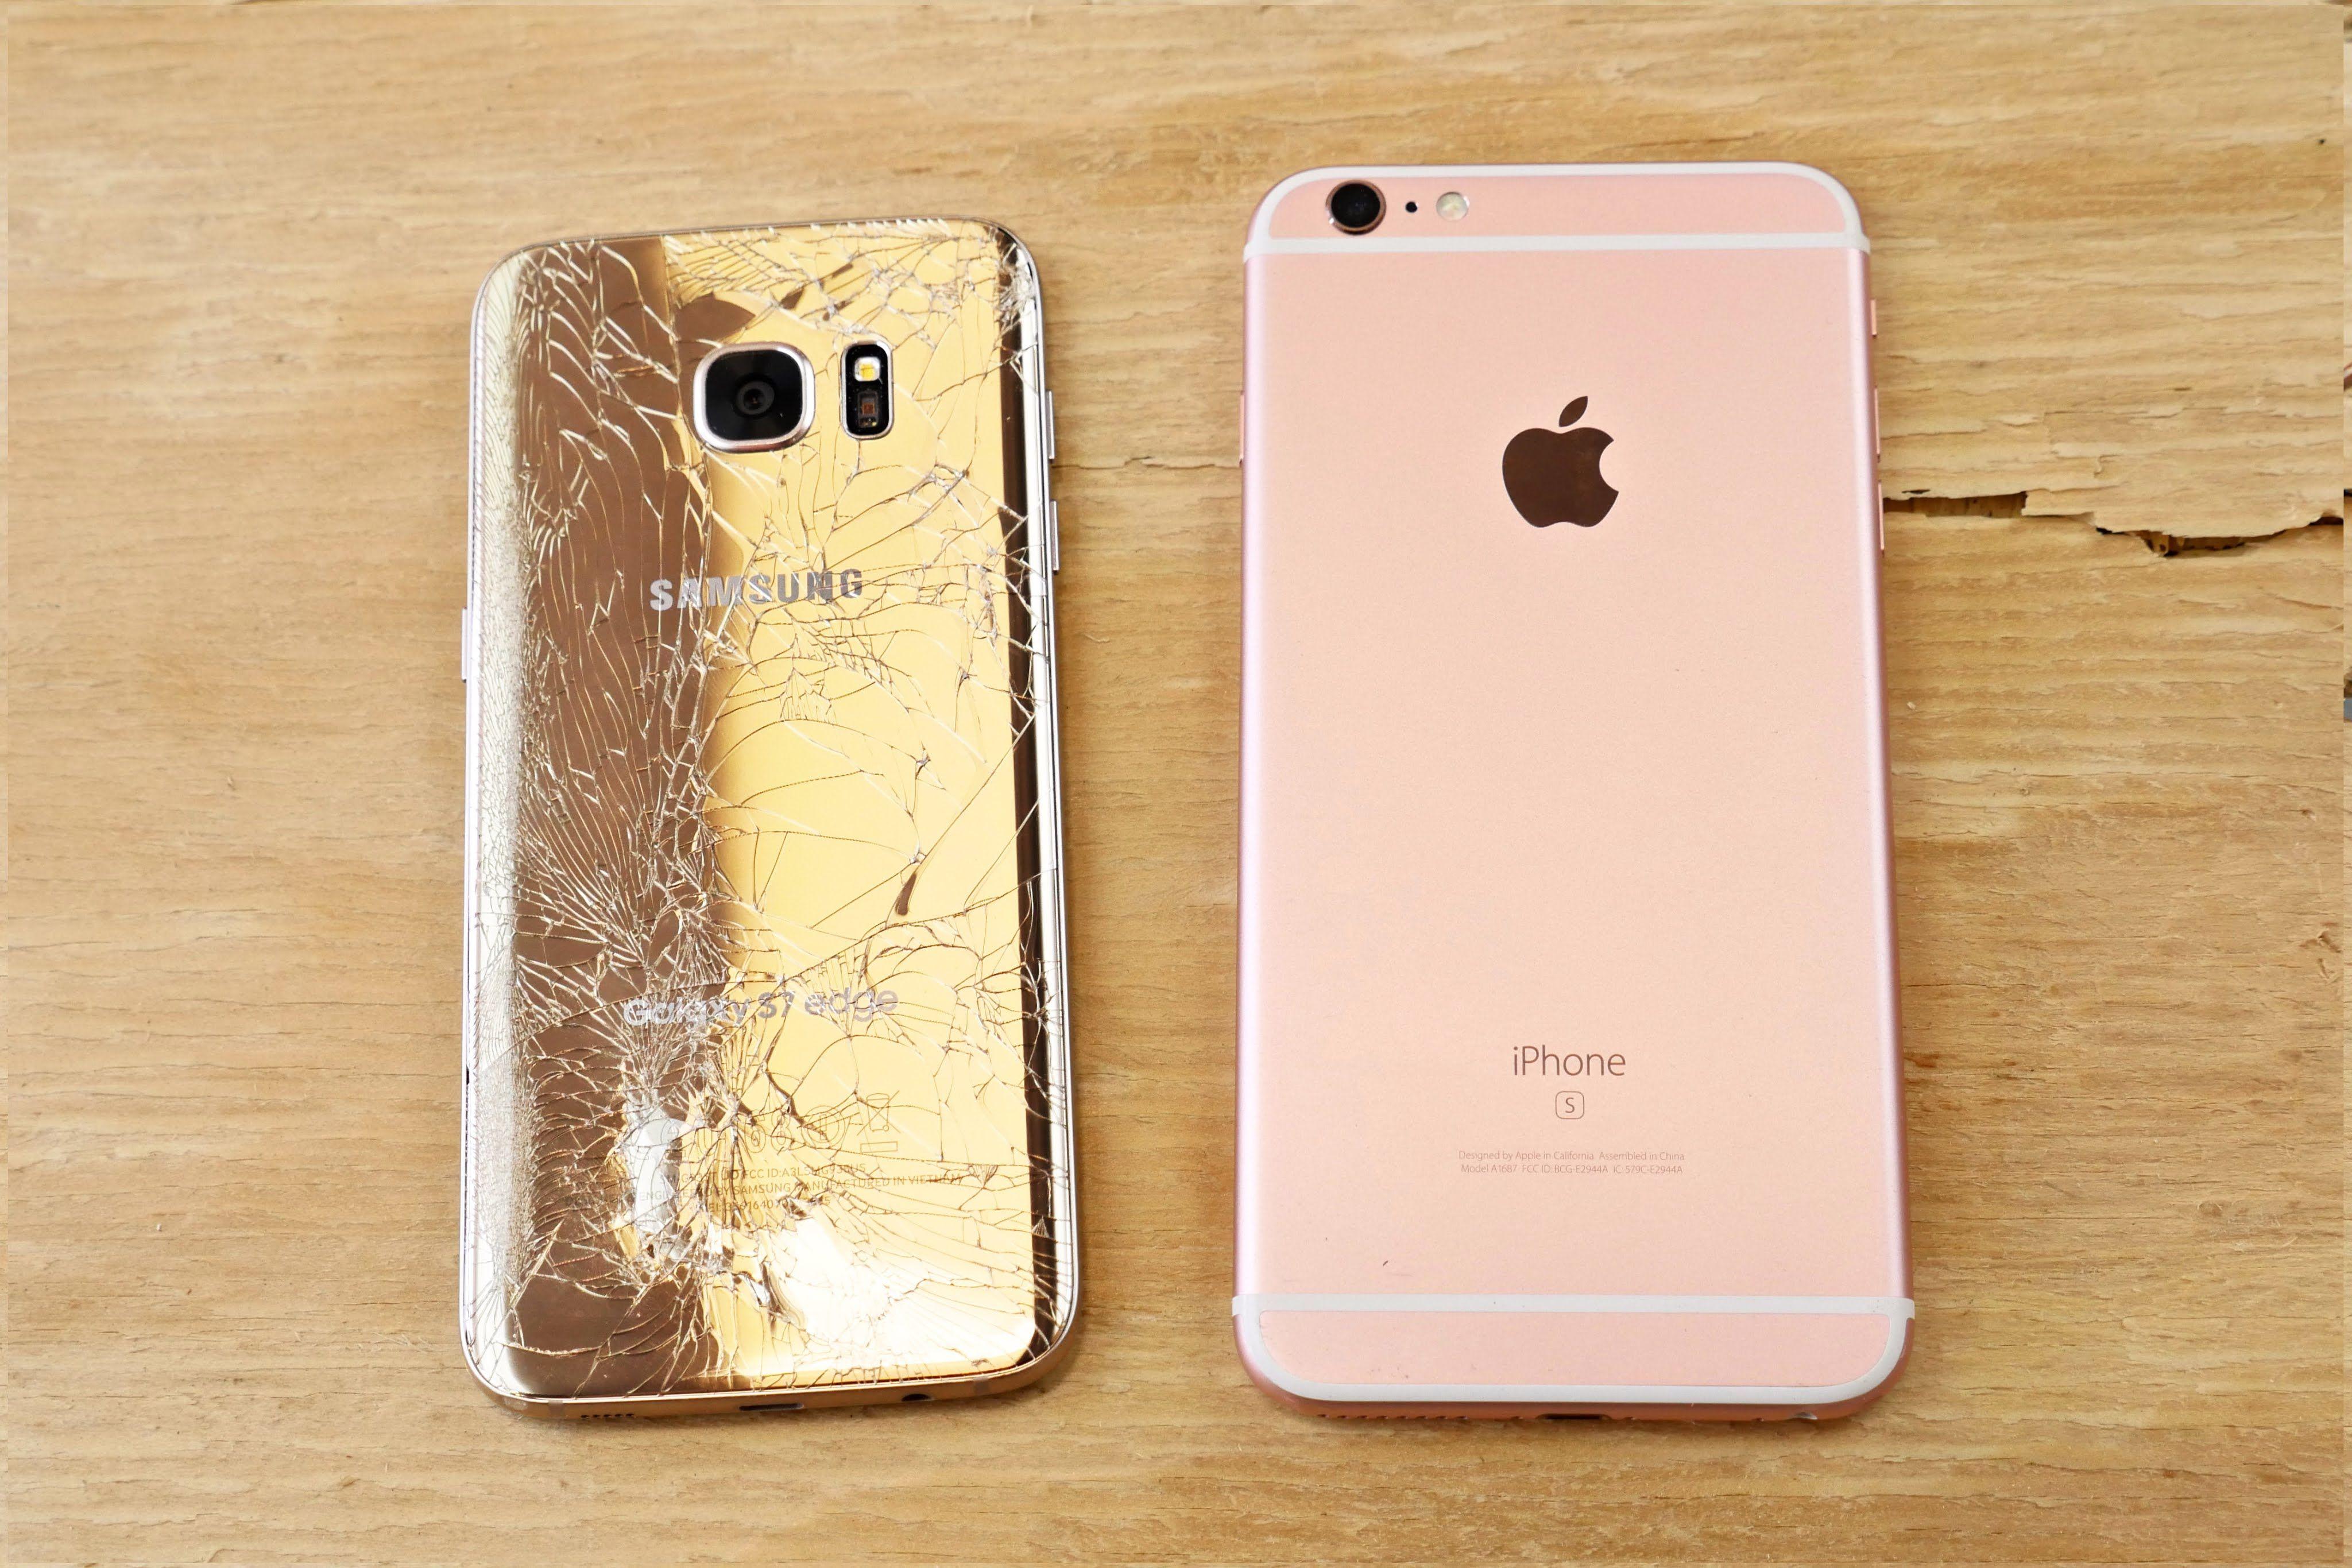 Samsung Galaxy S7 Edge Vs Iphone 6s Plus Drop Test Iphone Samsung Galaxy S7 Samsung Galaxy S7 Edge